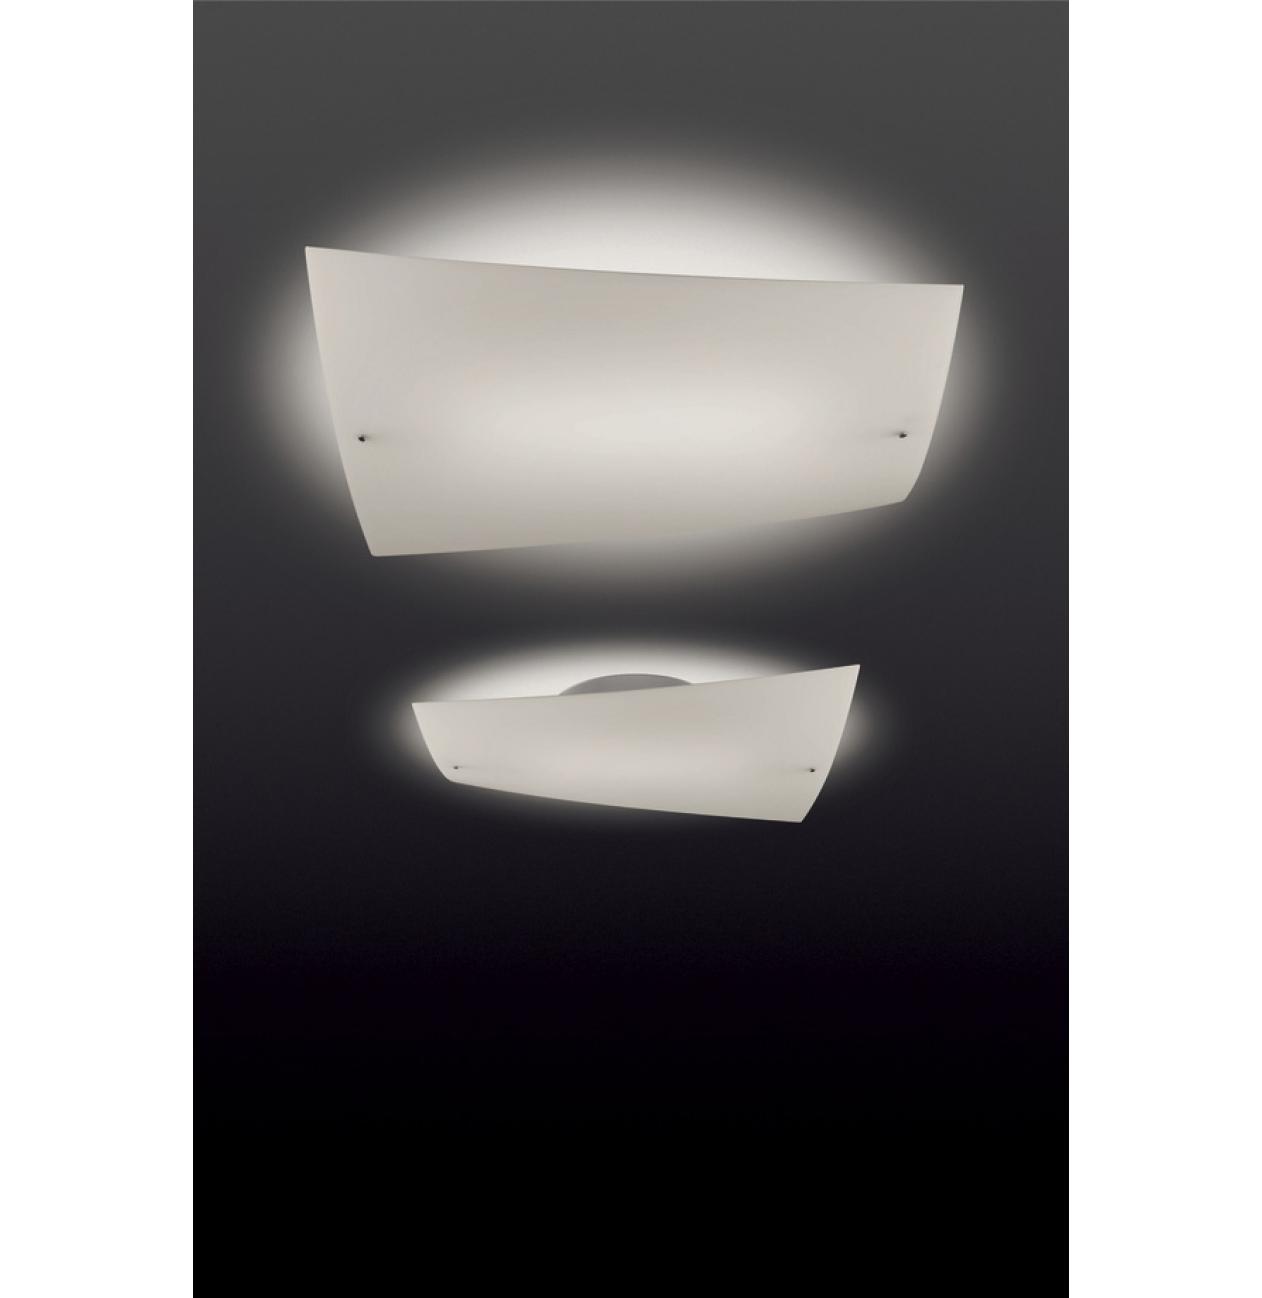 Foscarini plafondlamp folio grande versteeg lichtstudio for Lampada bagno soffitto